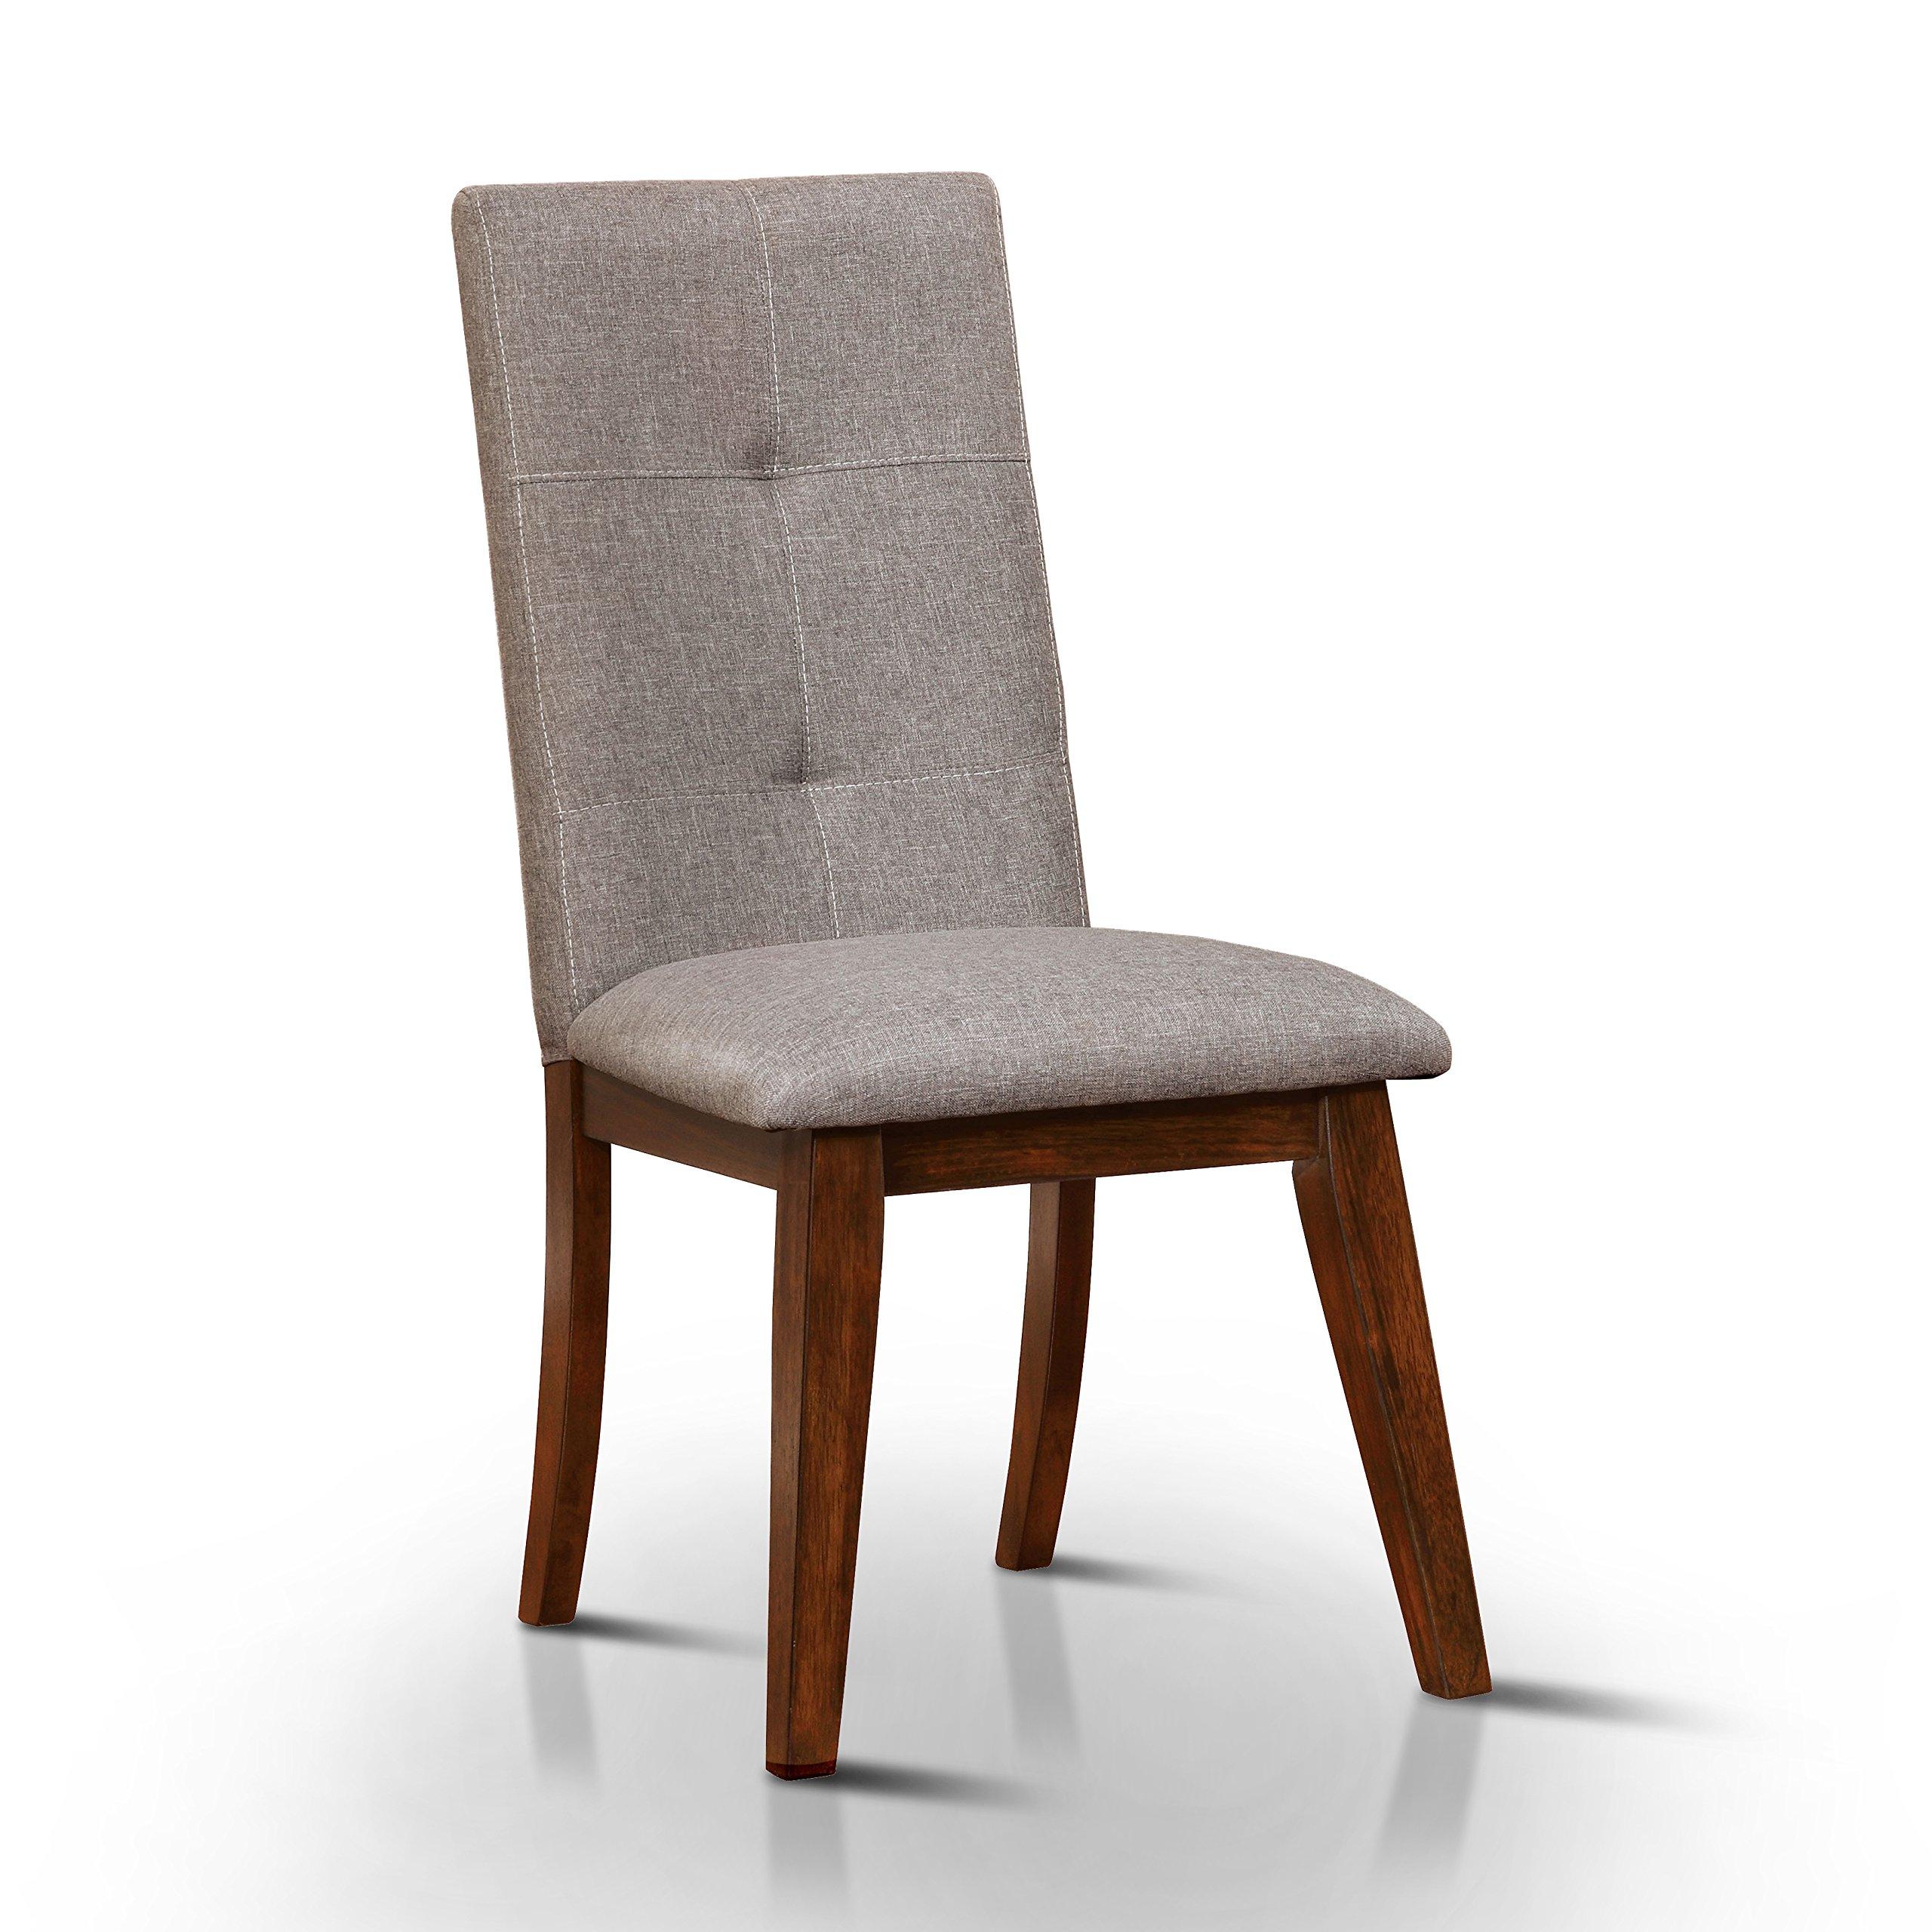 247SHOPATHOME IDF-3354SC Dining-Chairs, Walnut